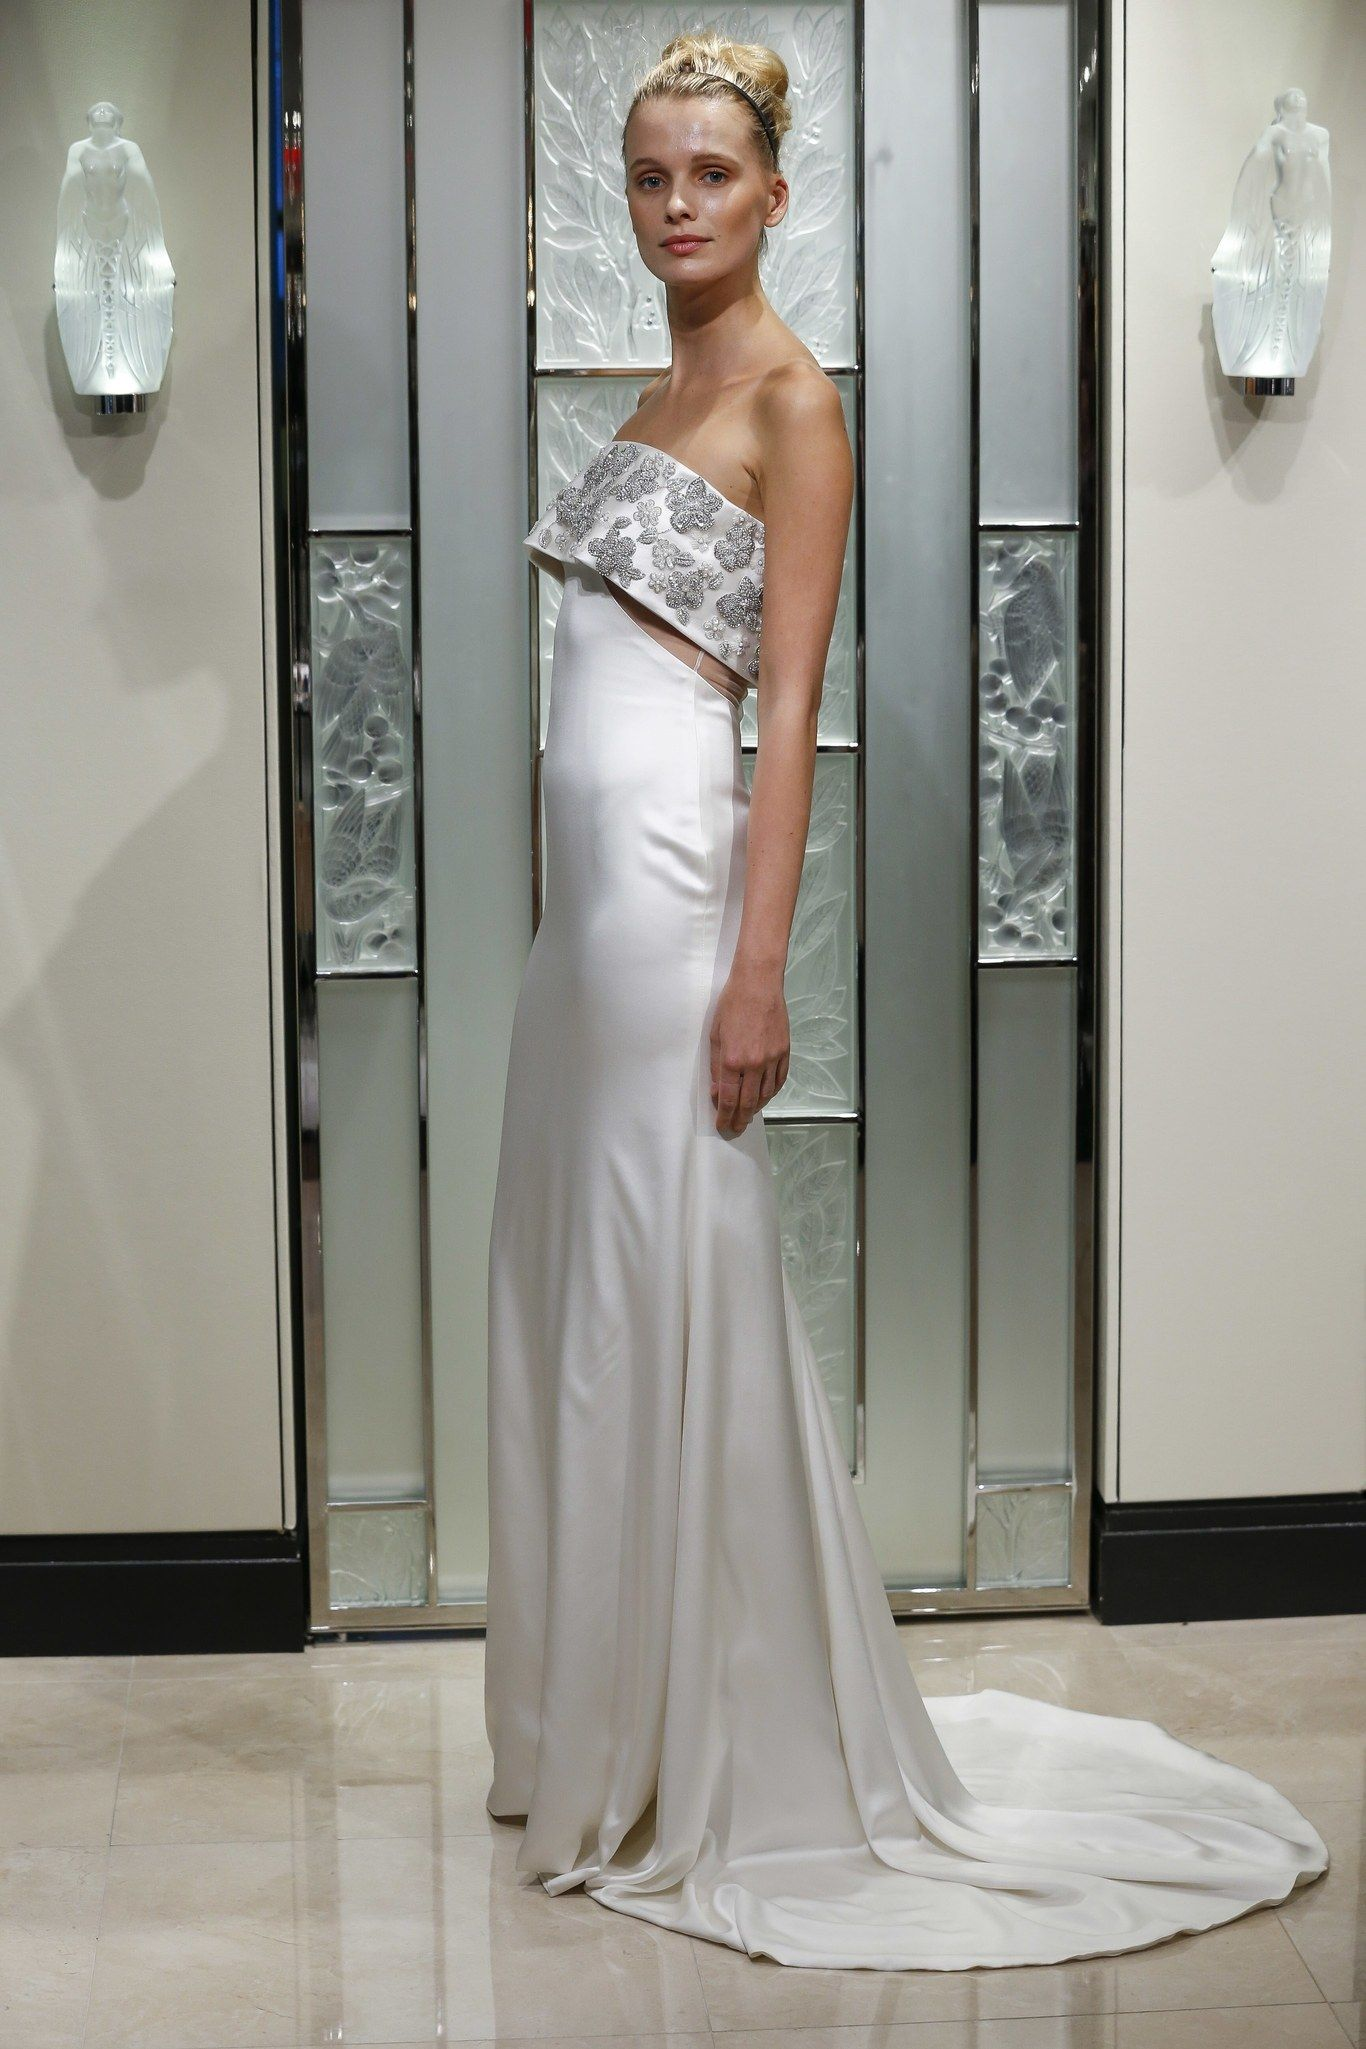 cbc6c42c31 Fashion Shows - Gracy Accad Frühjahr Sommer 2020 Bridal - Kollektion ...